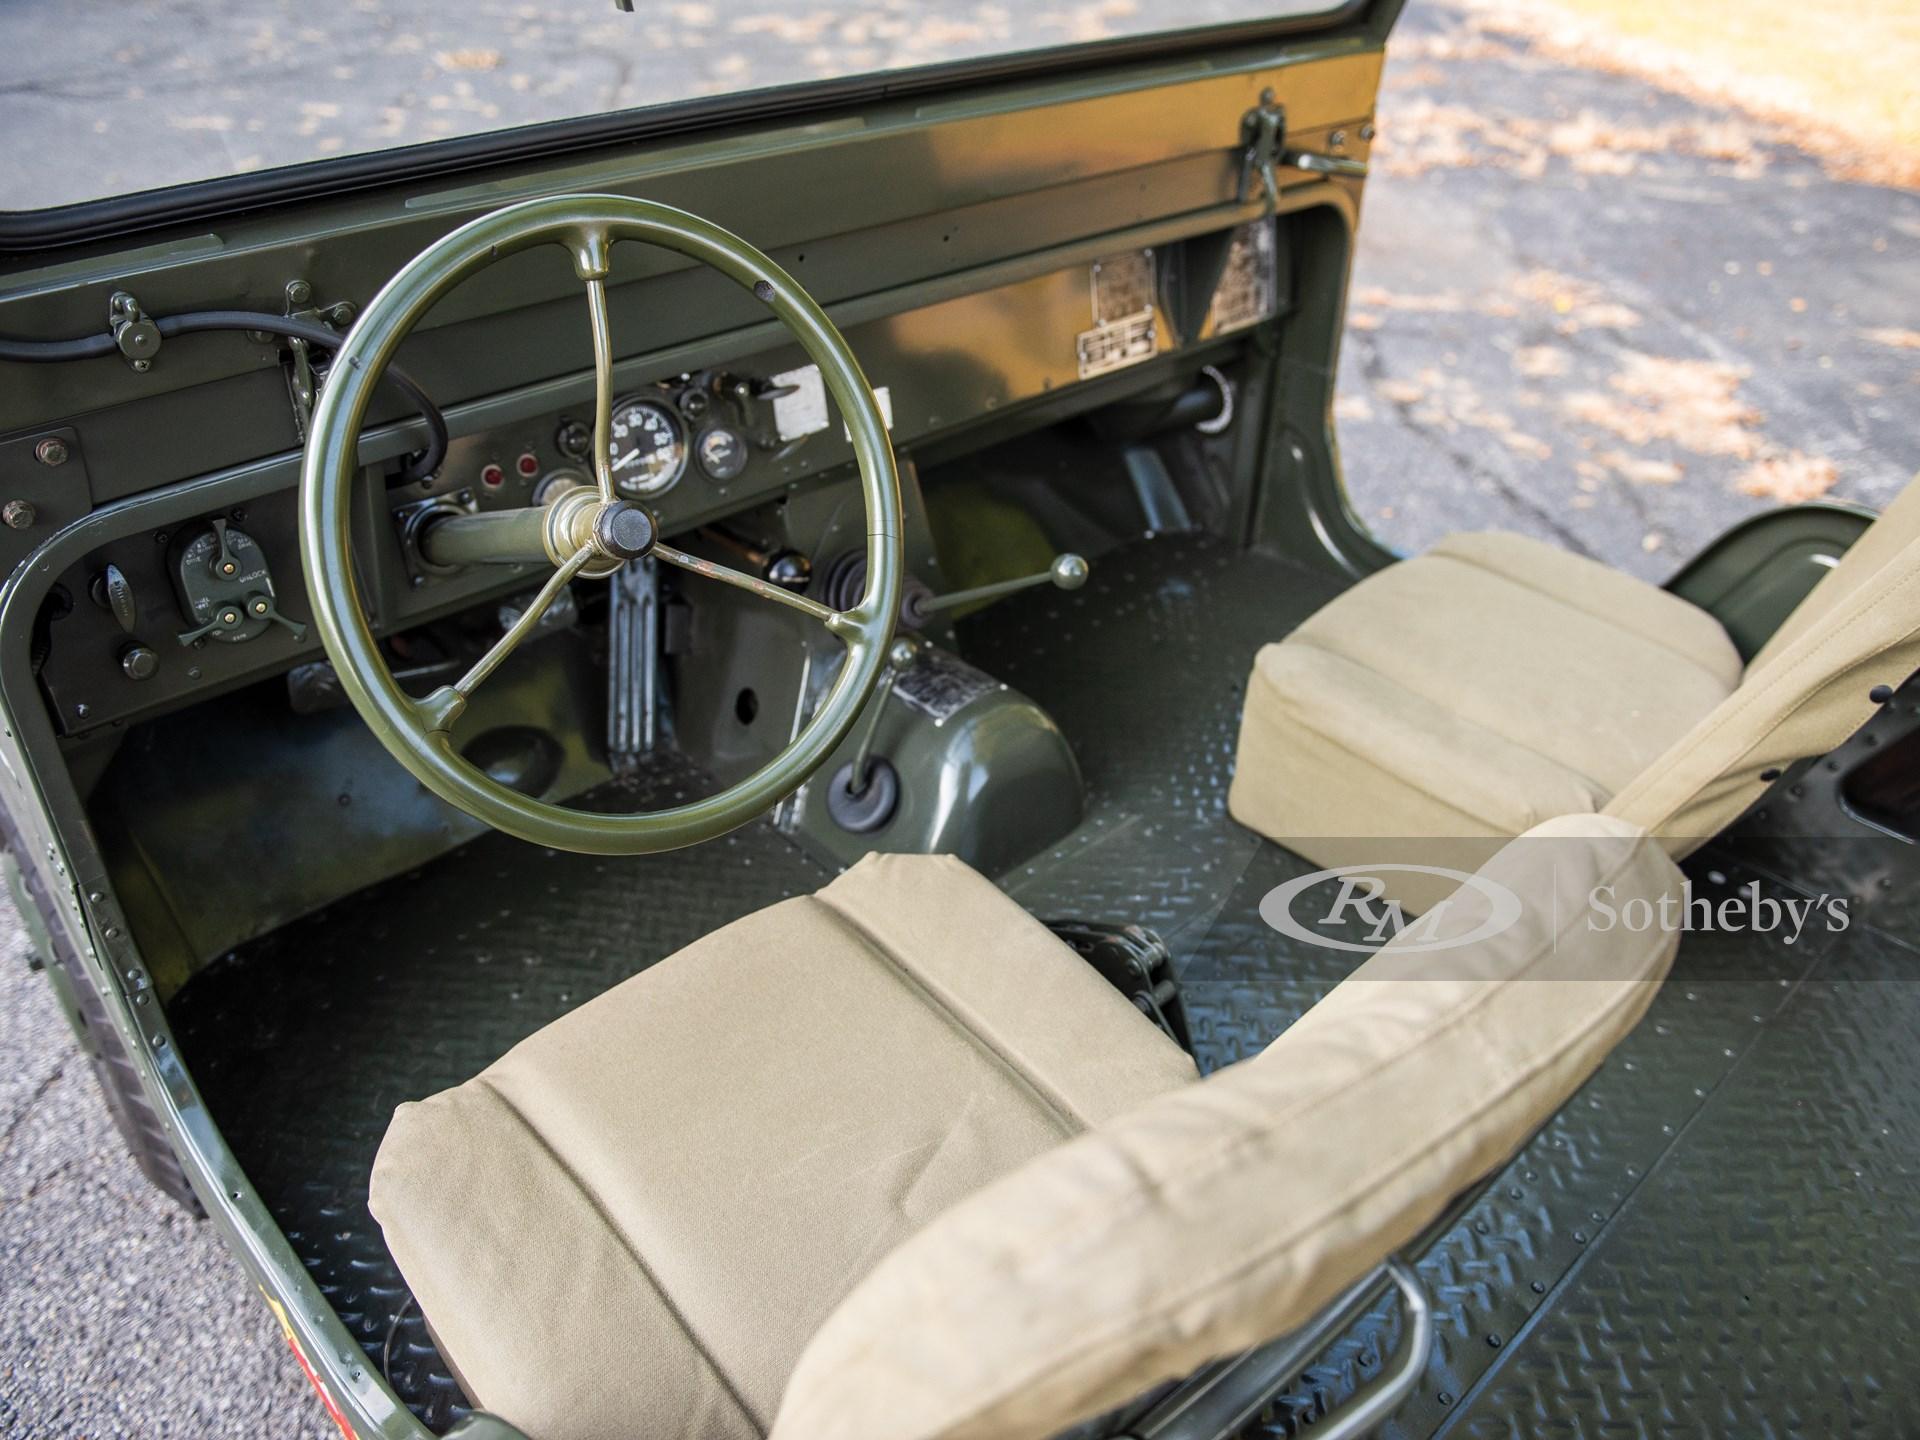 1963 American Motors M422A1 Mighty-Mite  -